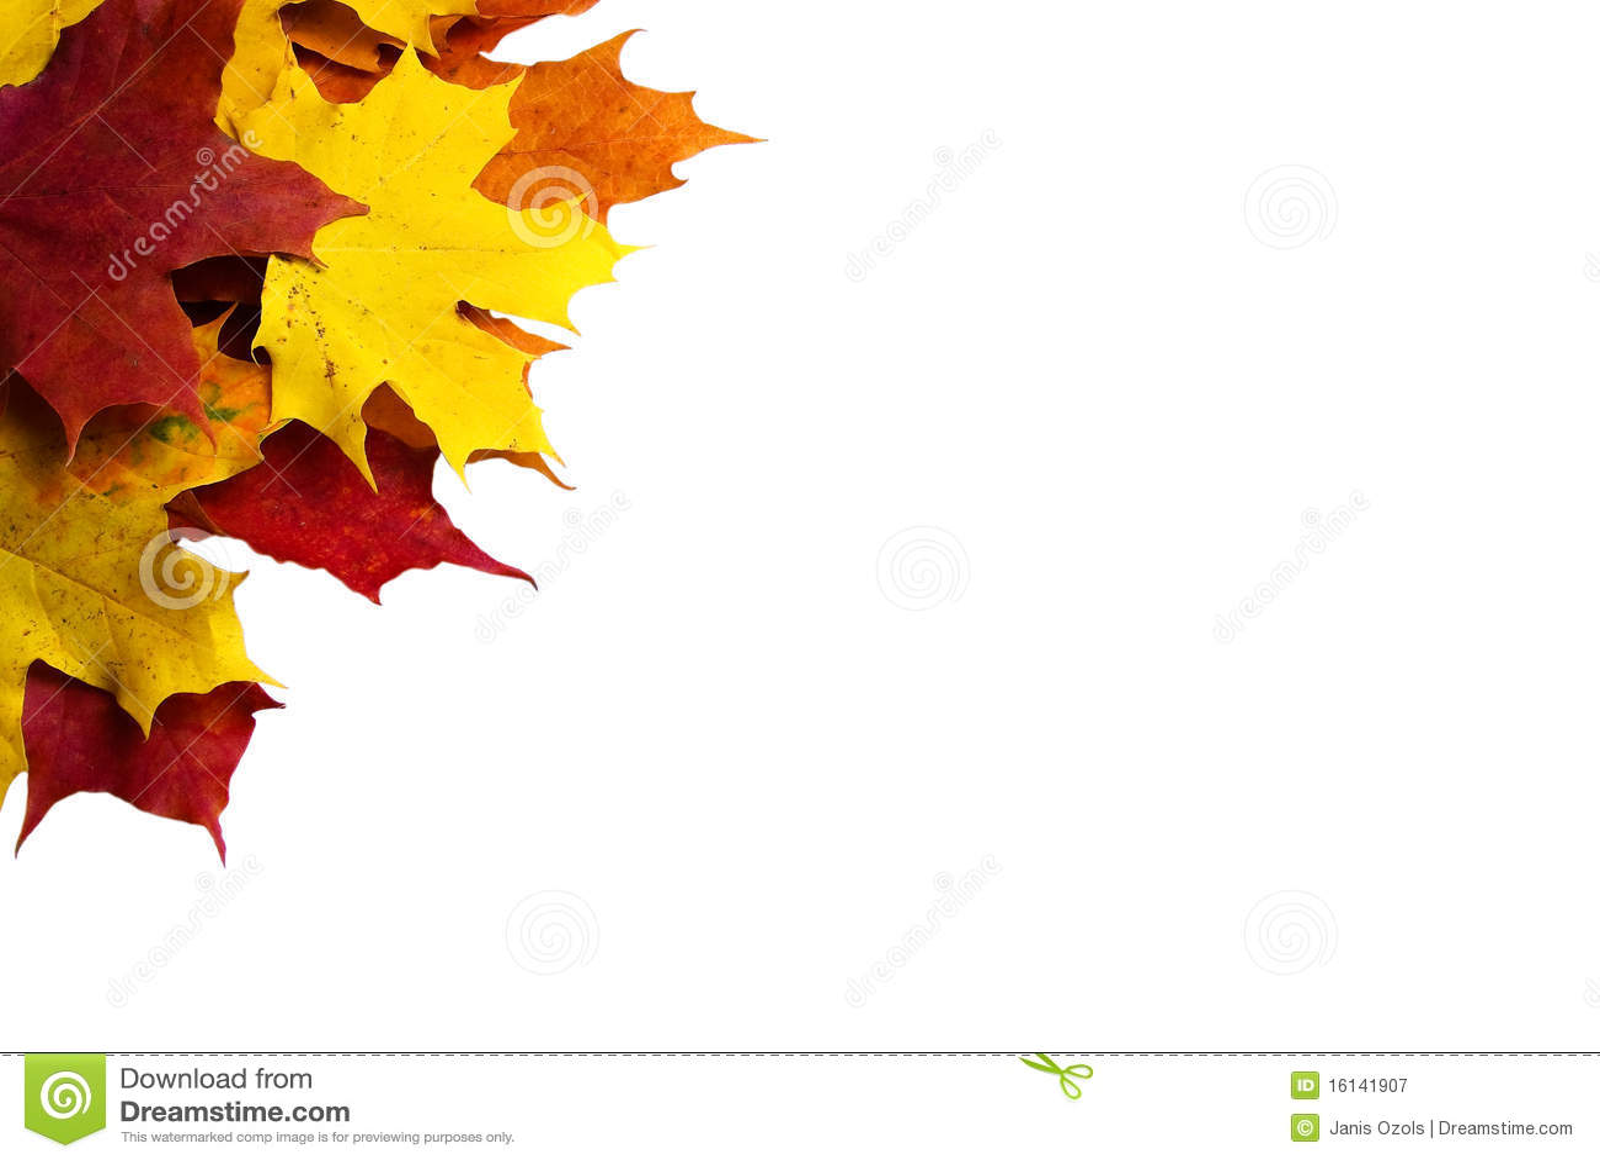 Autumn Leaves Corner Border